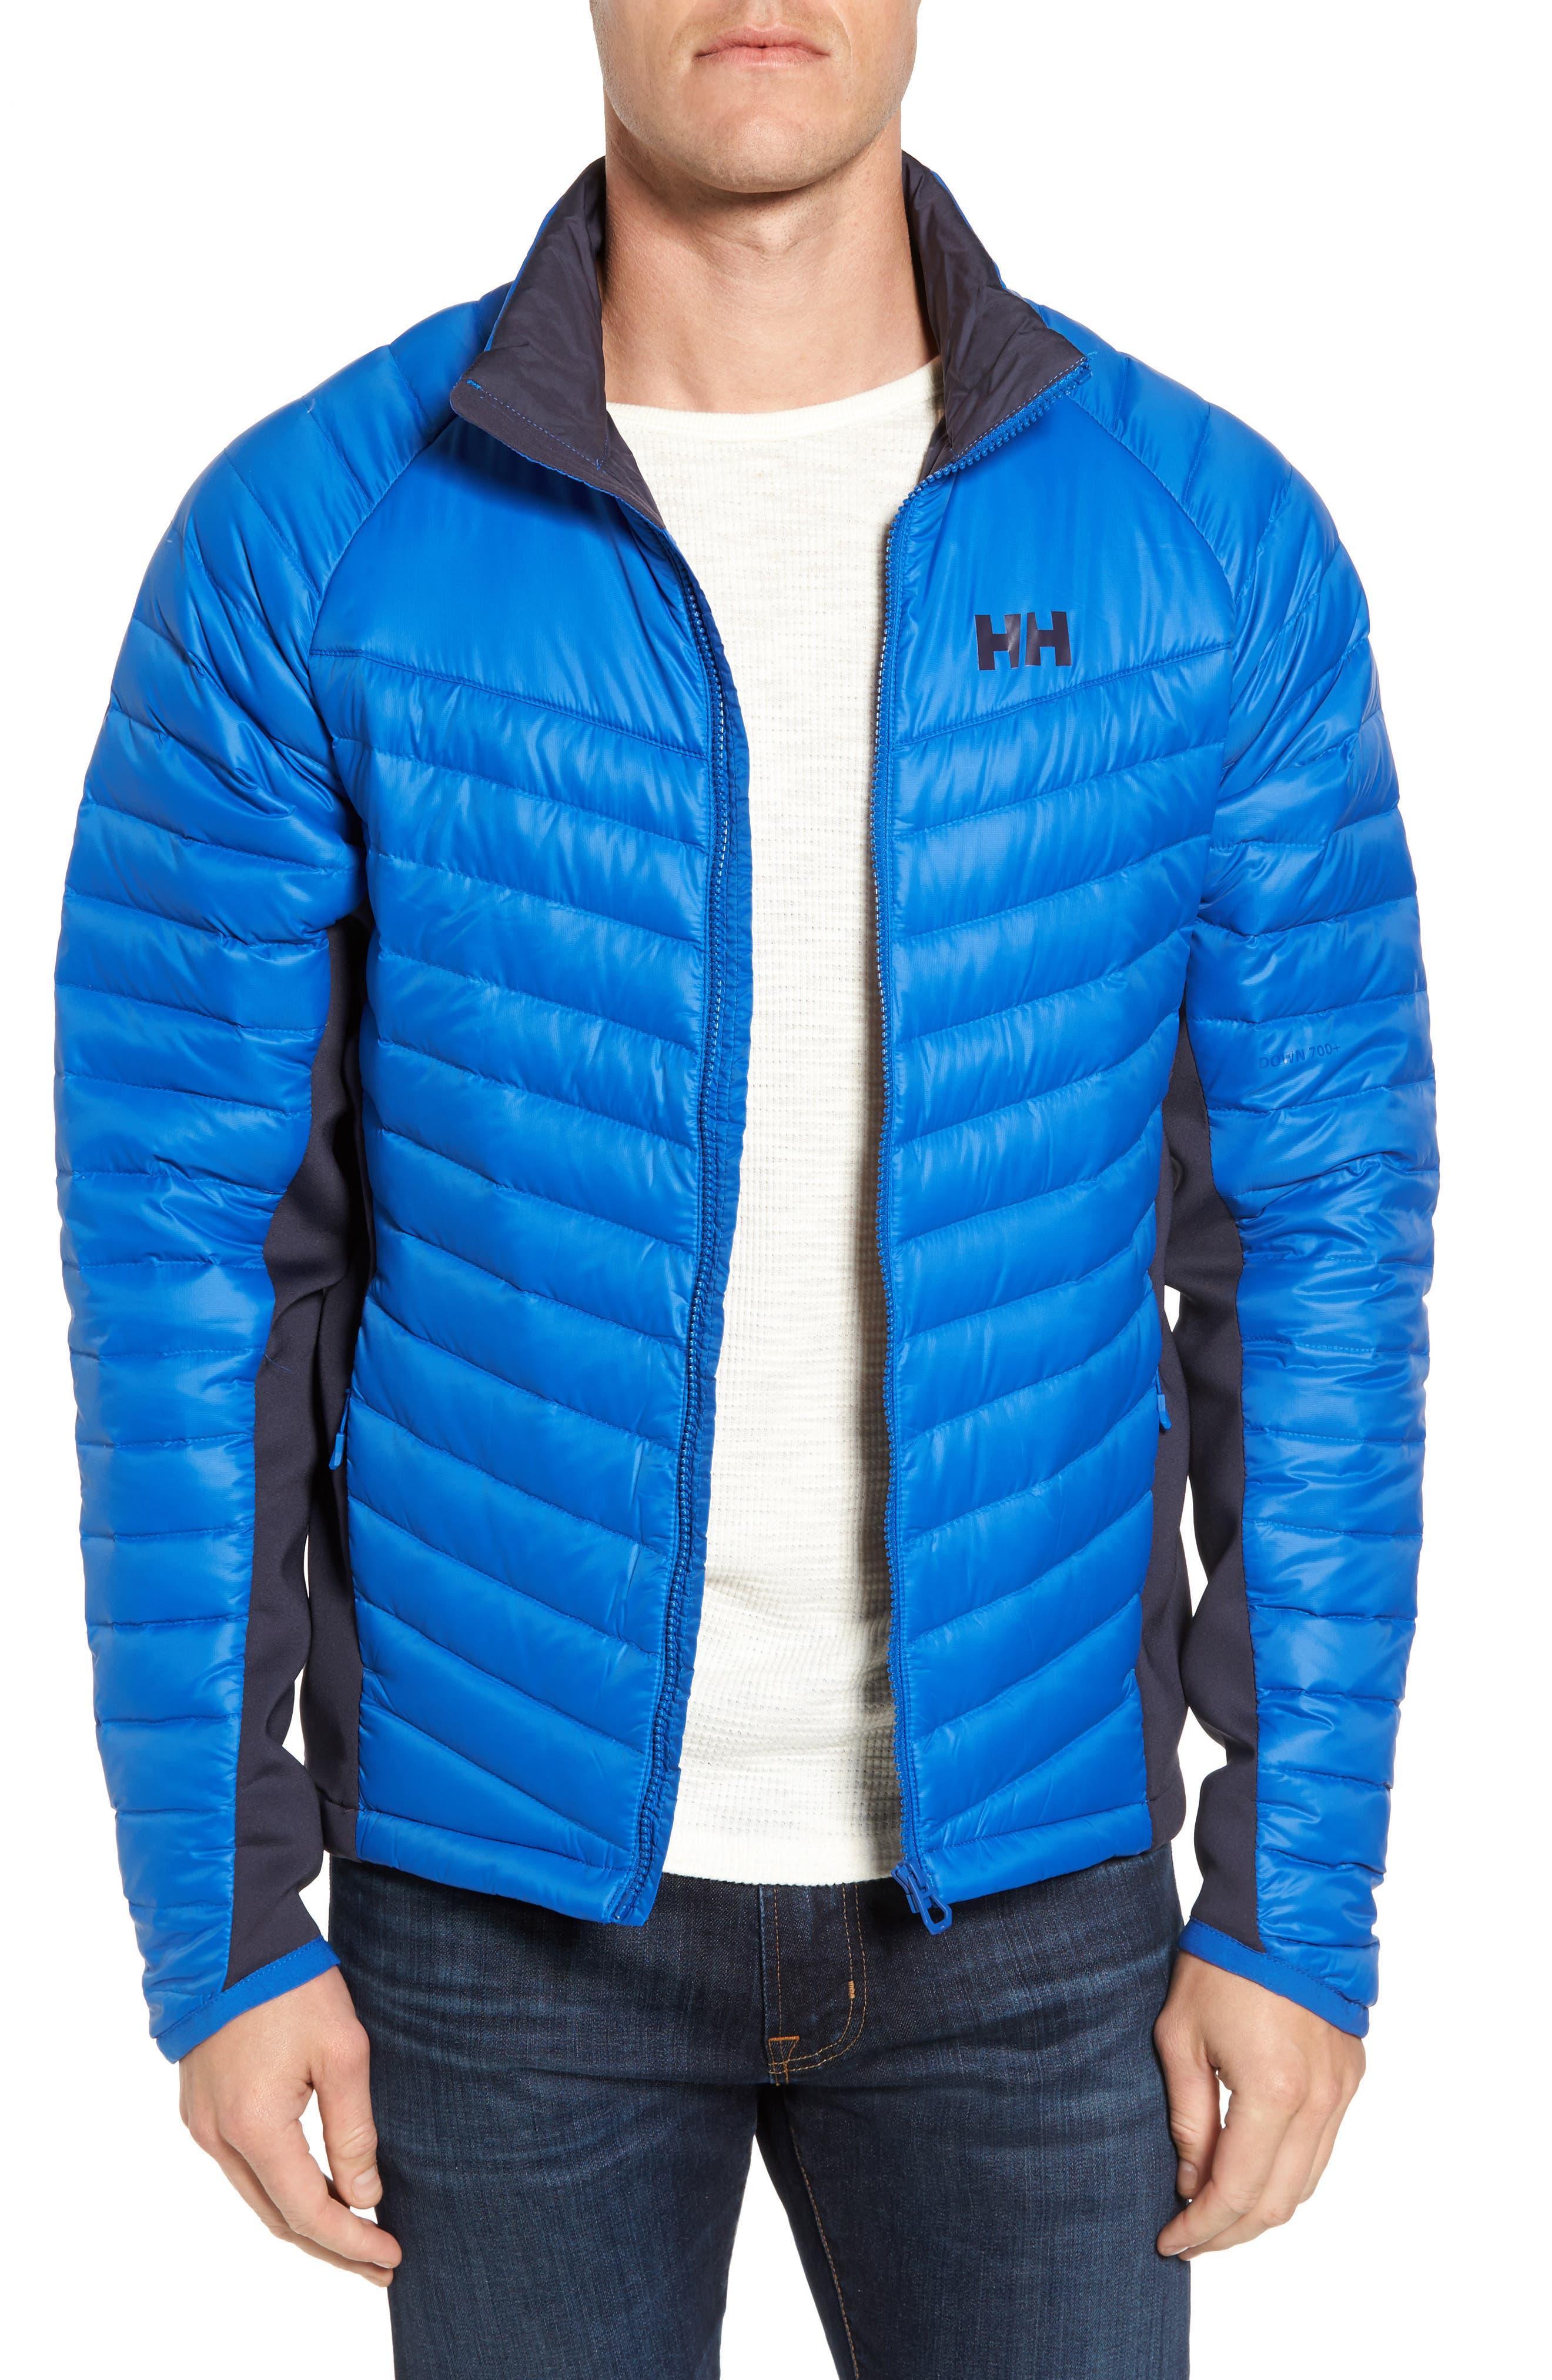 Verglas Insulator Hybrid Jacket,                             Main thumbnail 1, color,                             563 Olympian Blue